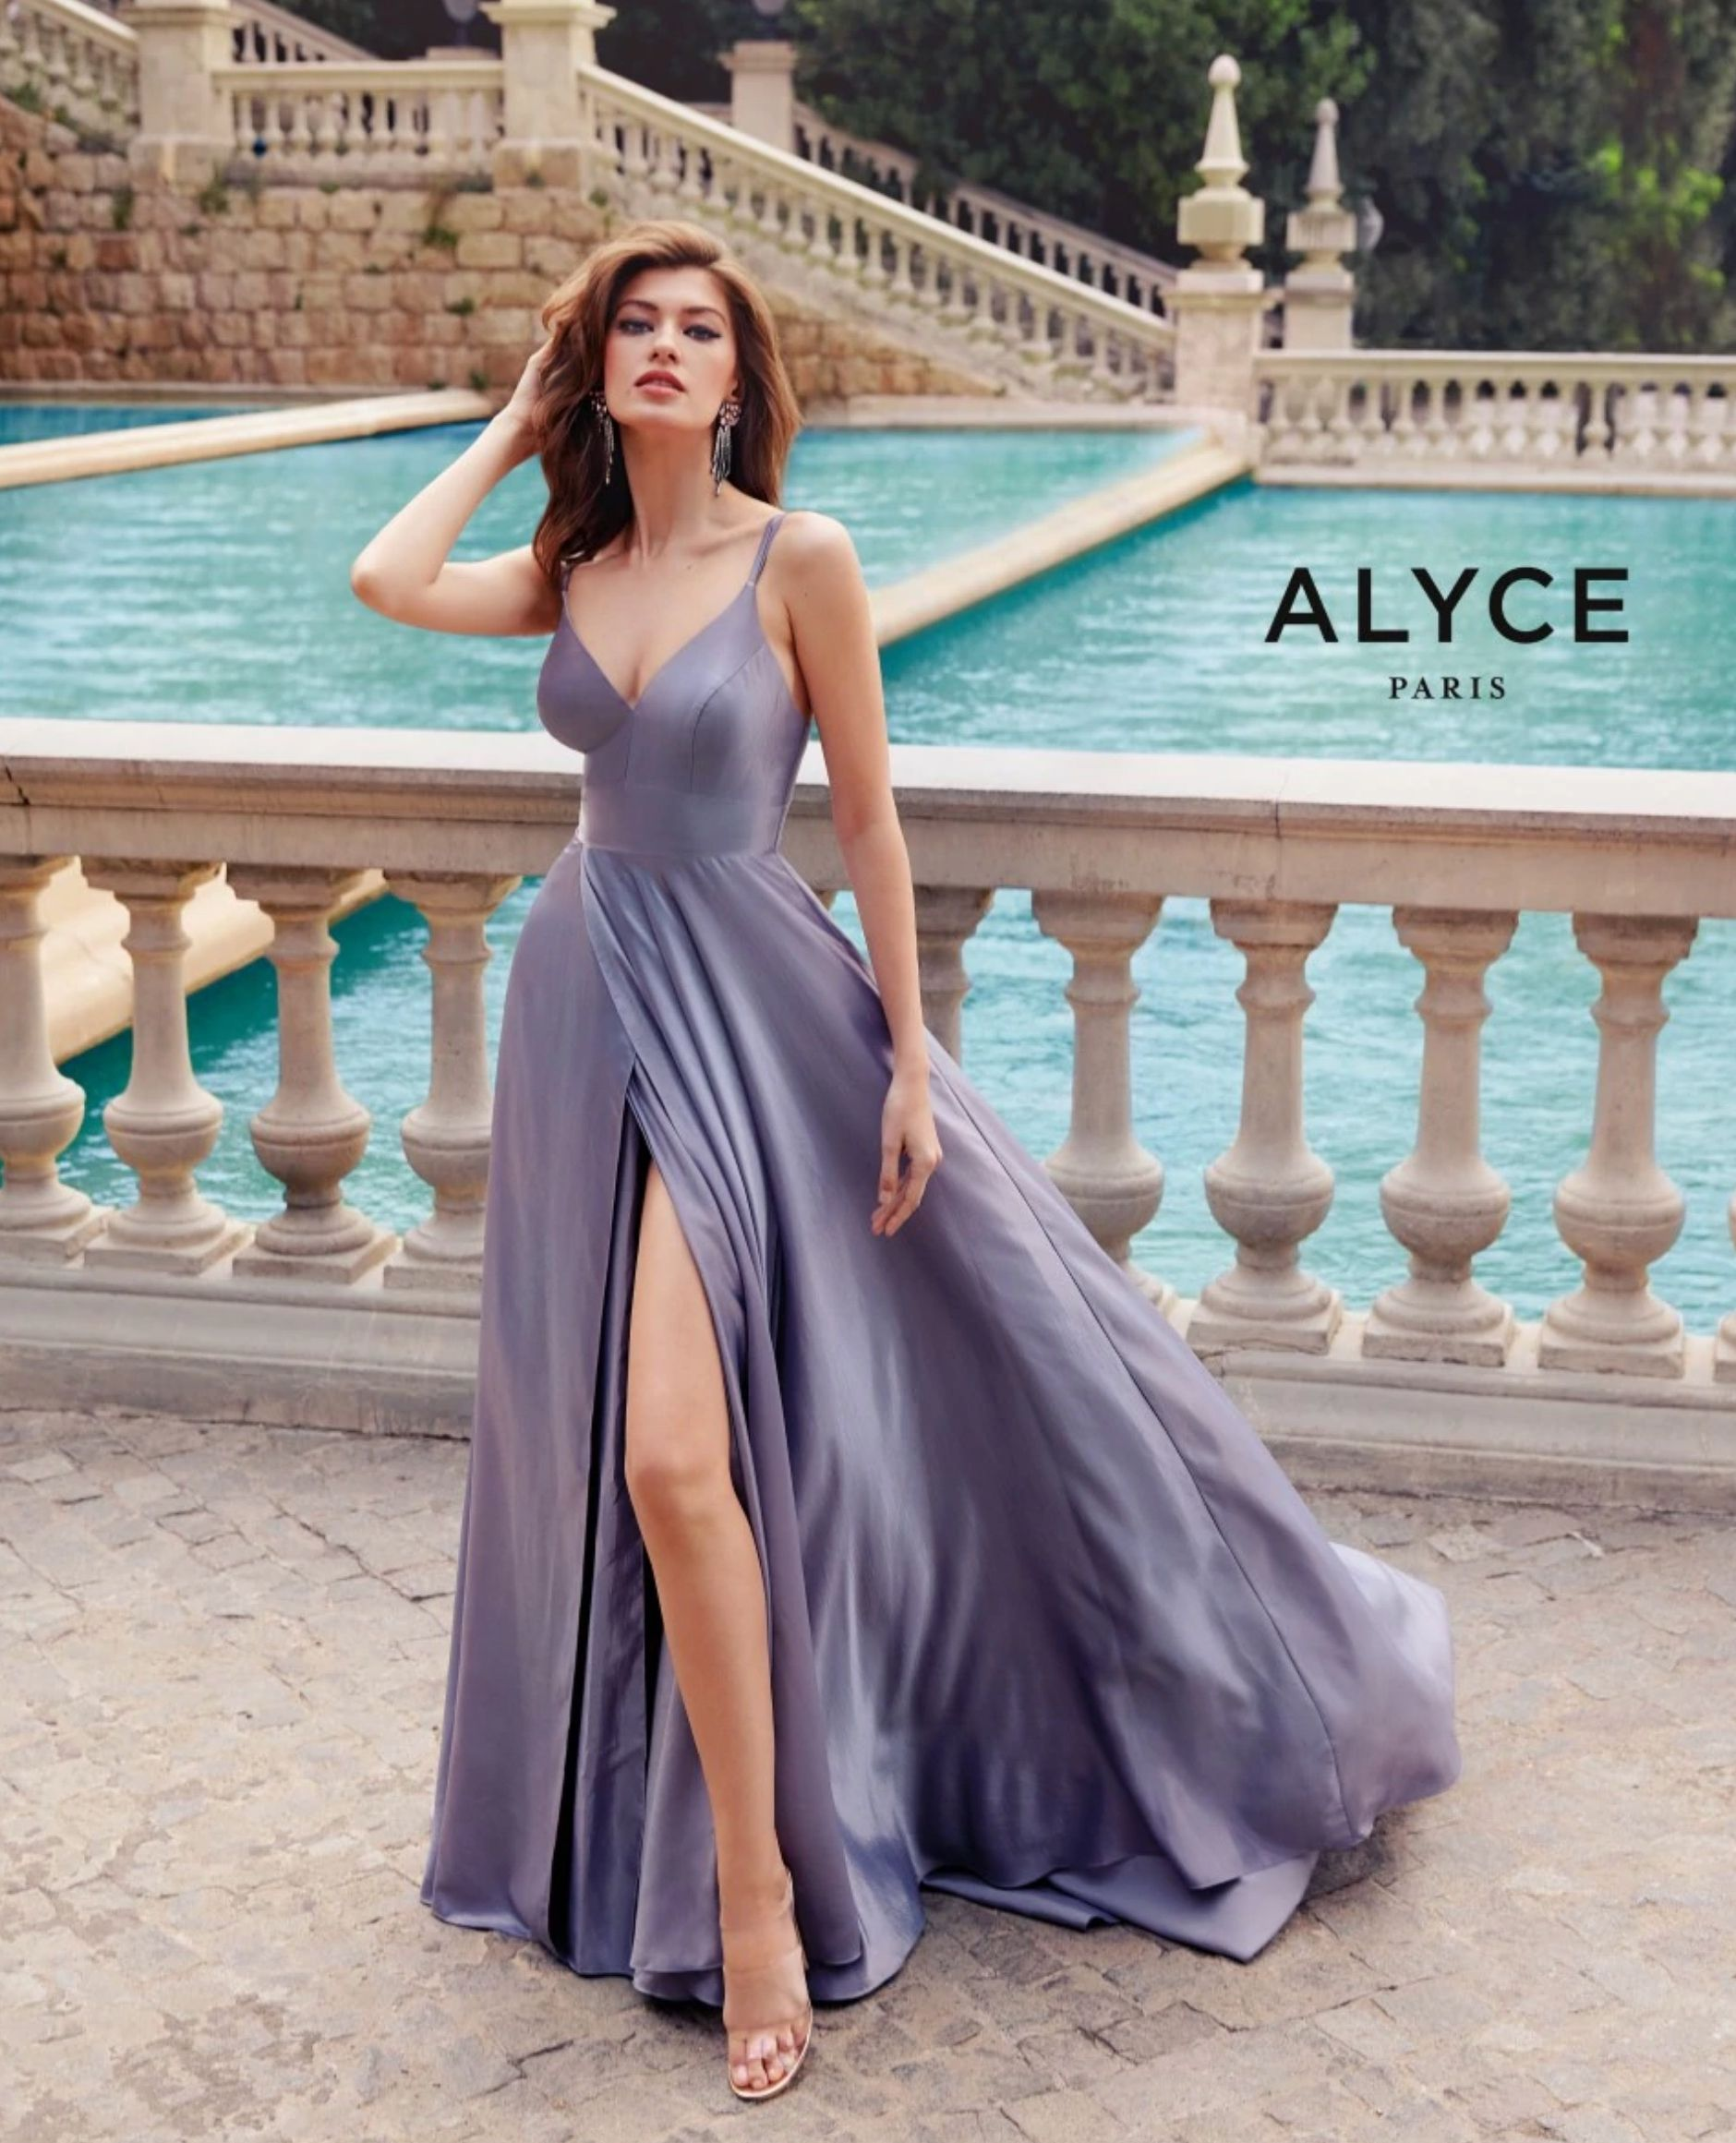 Formal Dress 60624 Long V Neck Medium Fullness In 2021 Lilac Prom Dresses Spring Prom Dresses Lavender Prom Dresses [ 2321 x 1880 Pixel ]